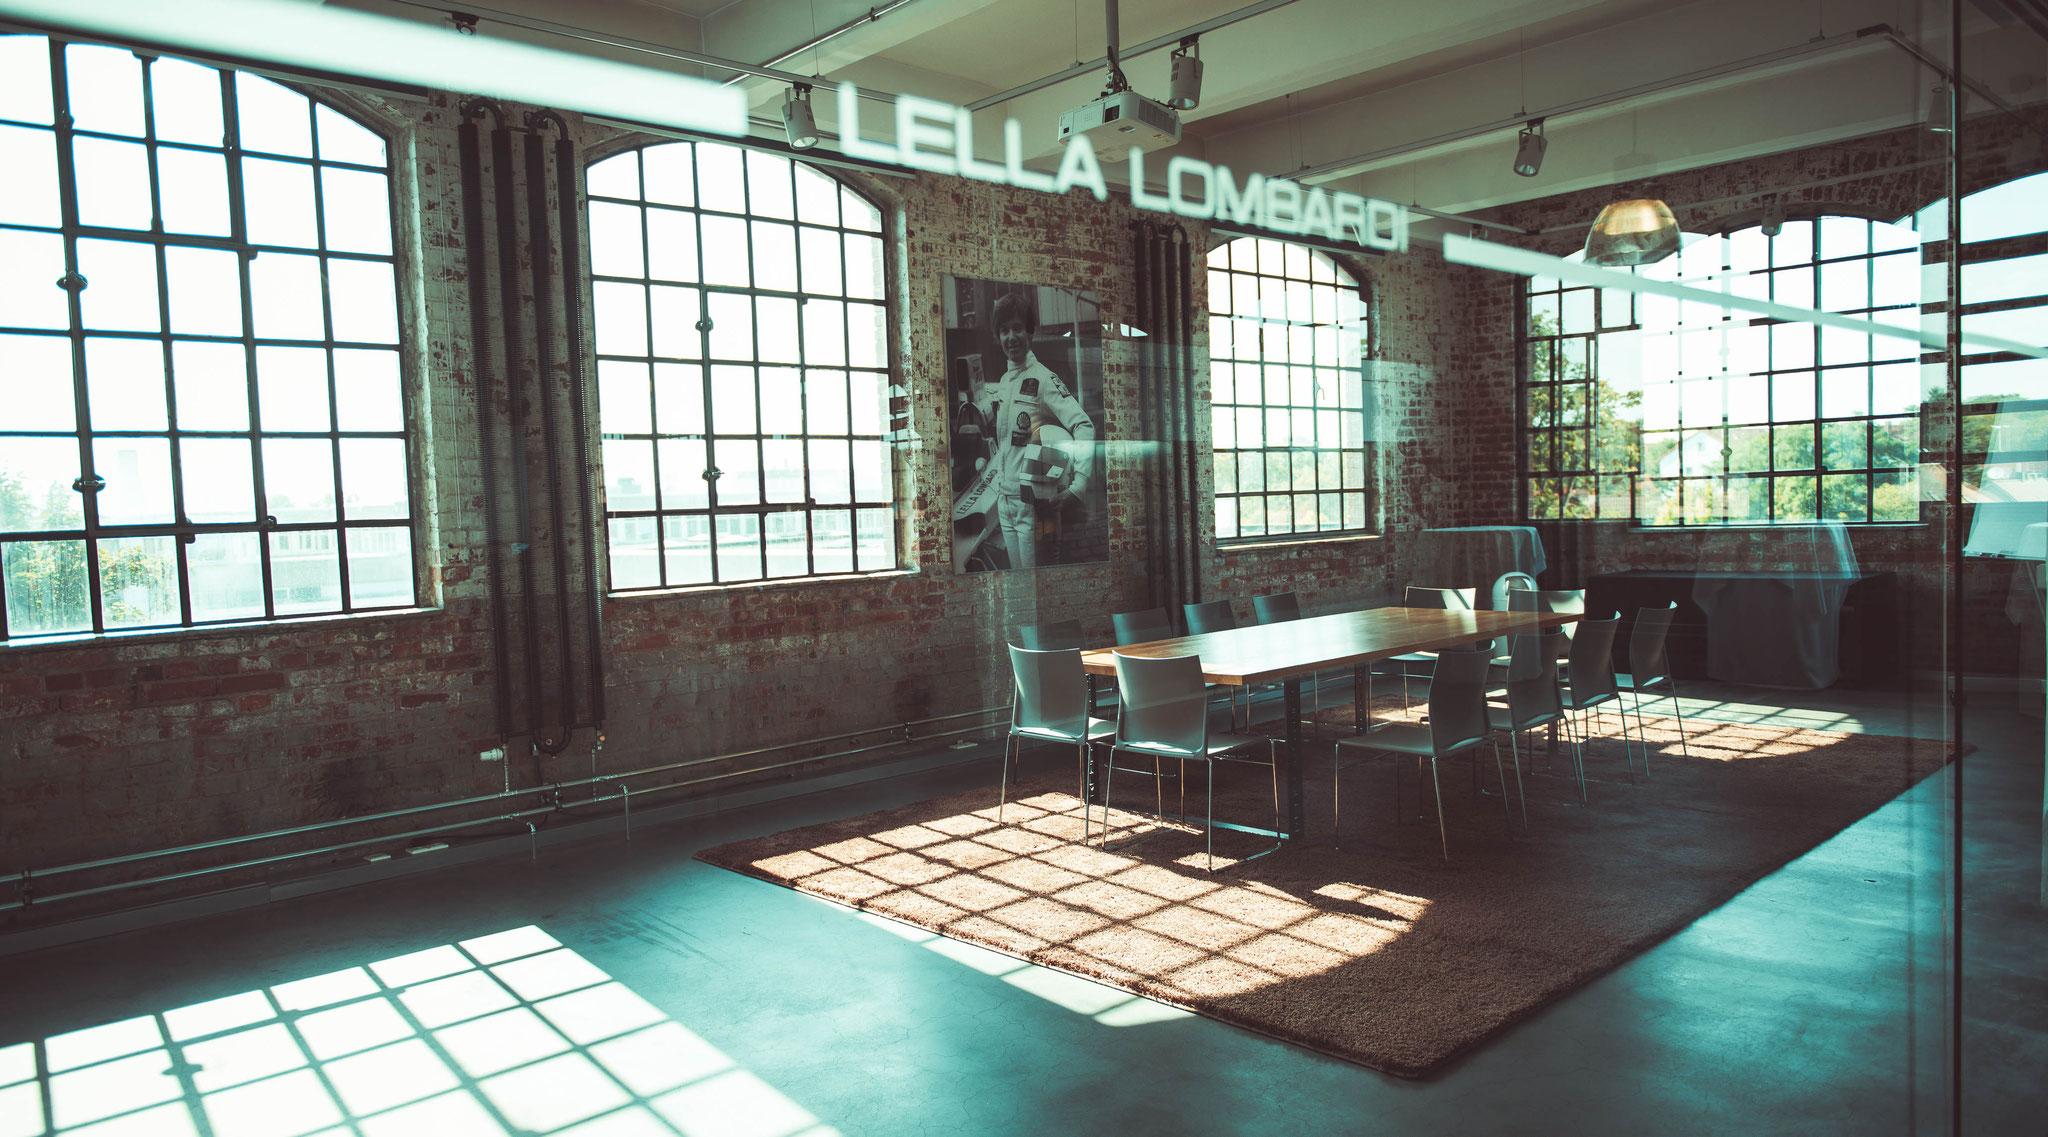 Lella Lombardi - Besprechungsraum